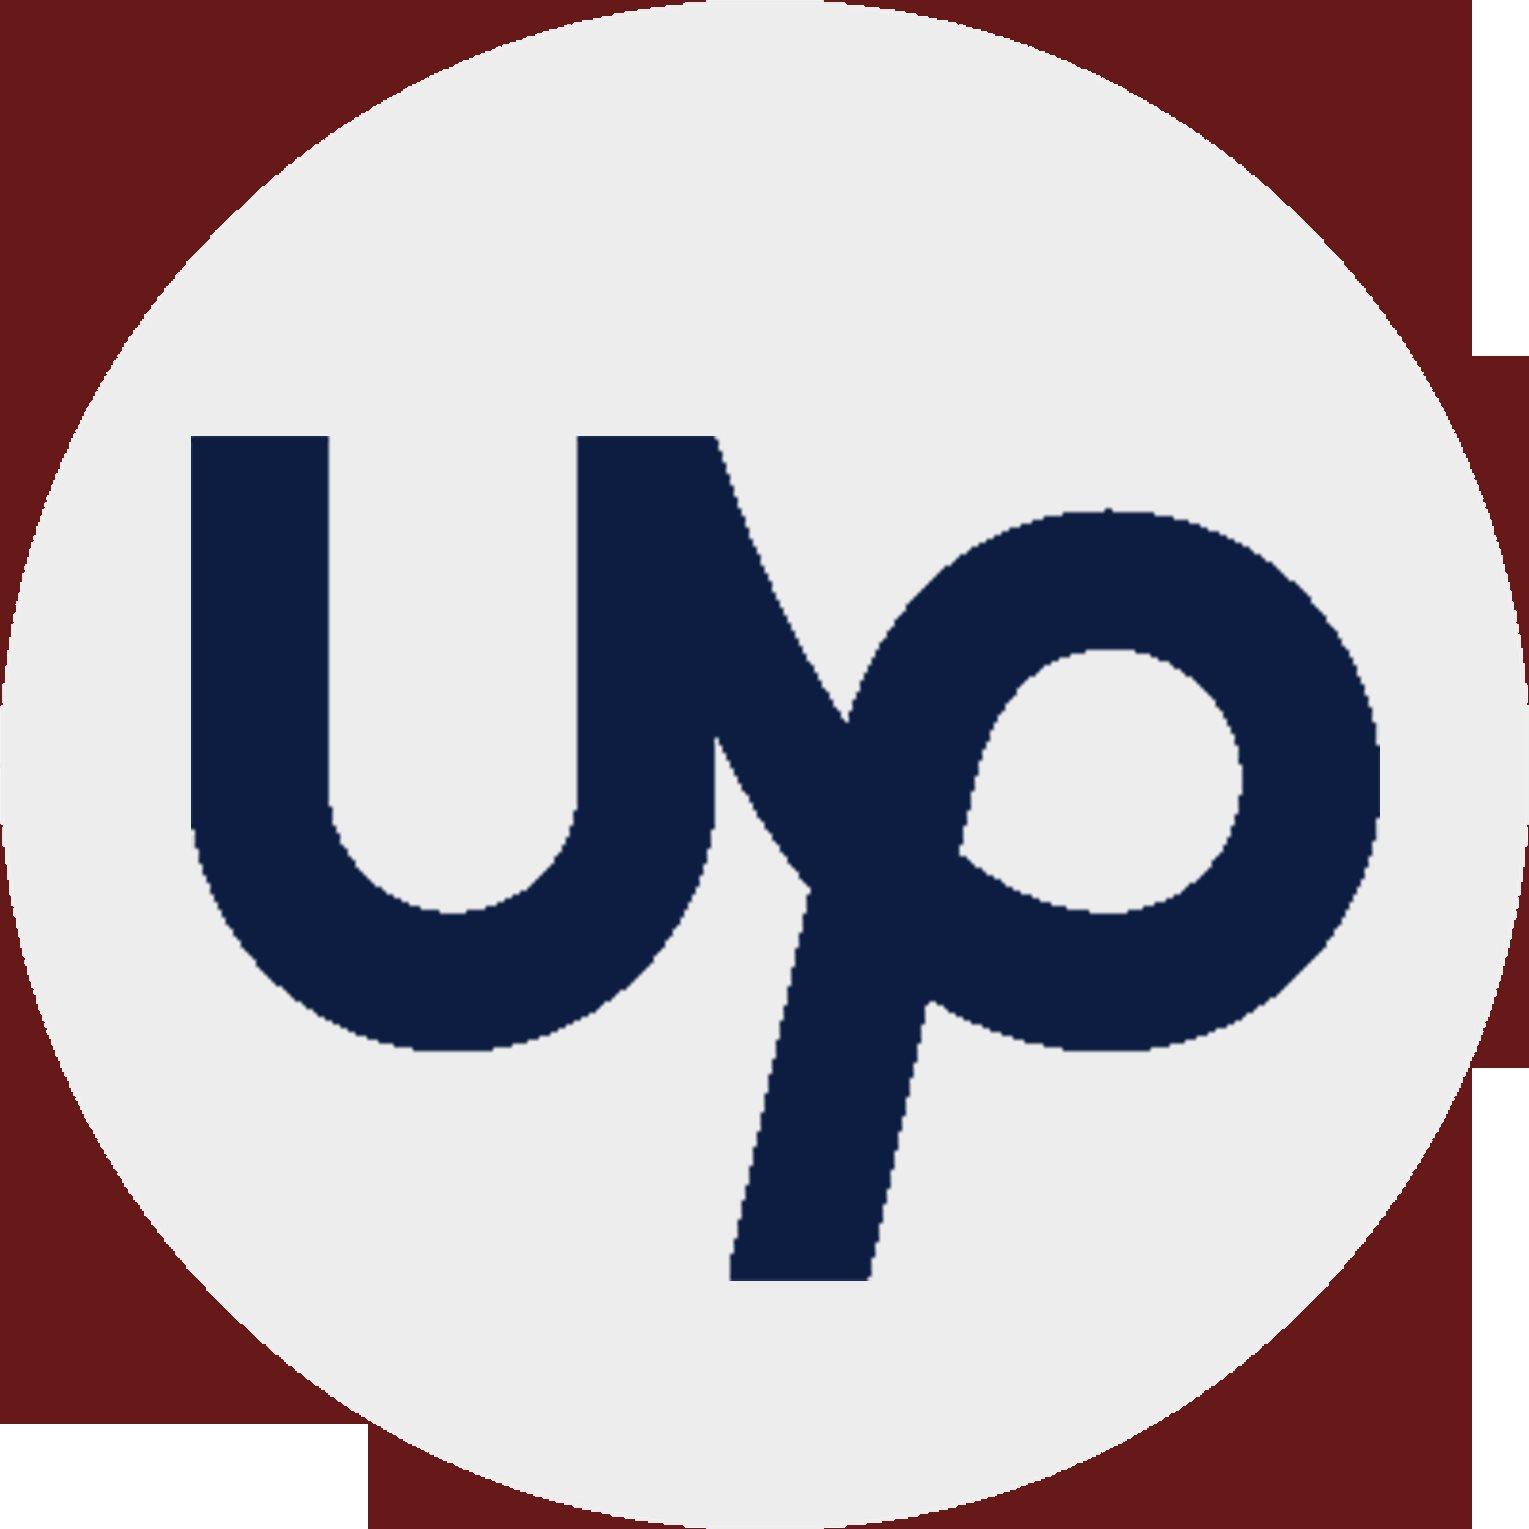 UPWORK MANPOWER